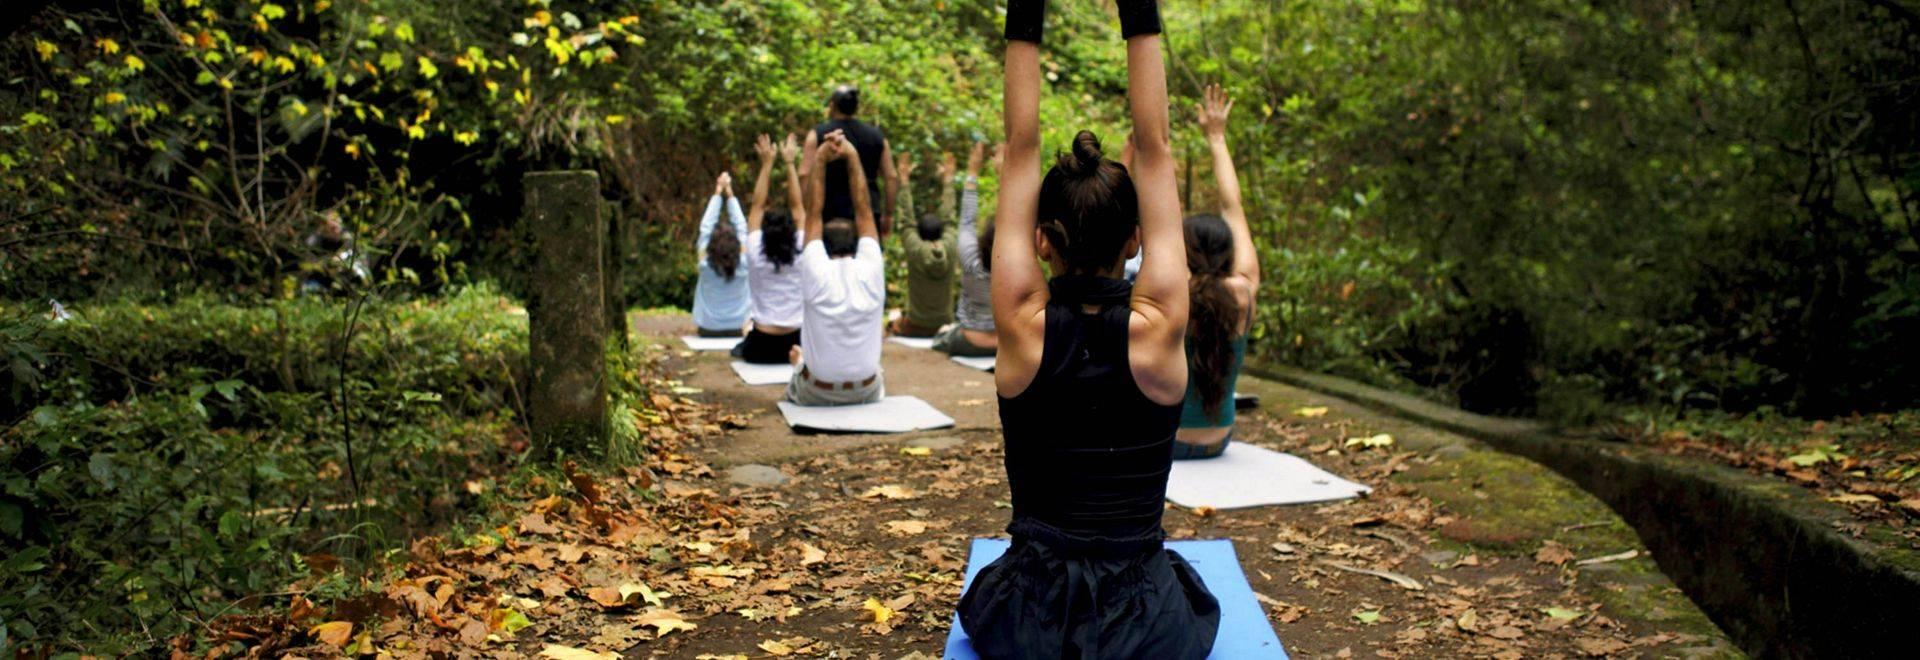 Galo-Resort-forest-yoga.jpg